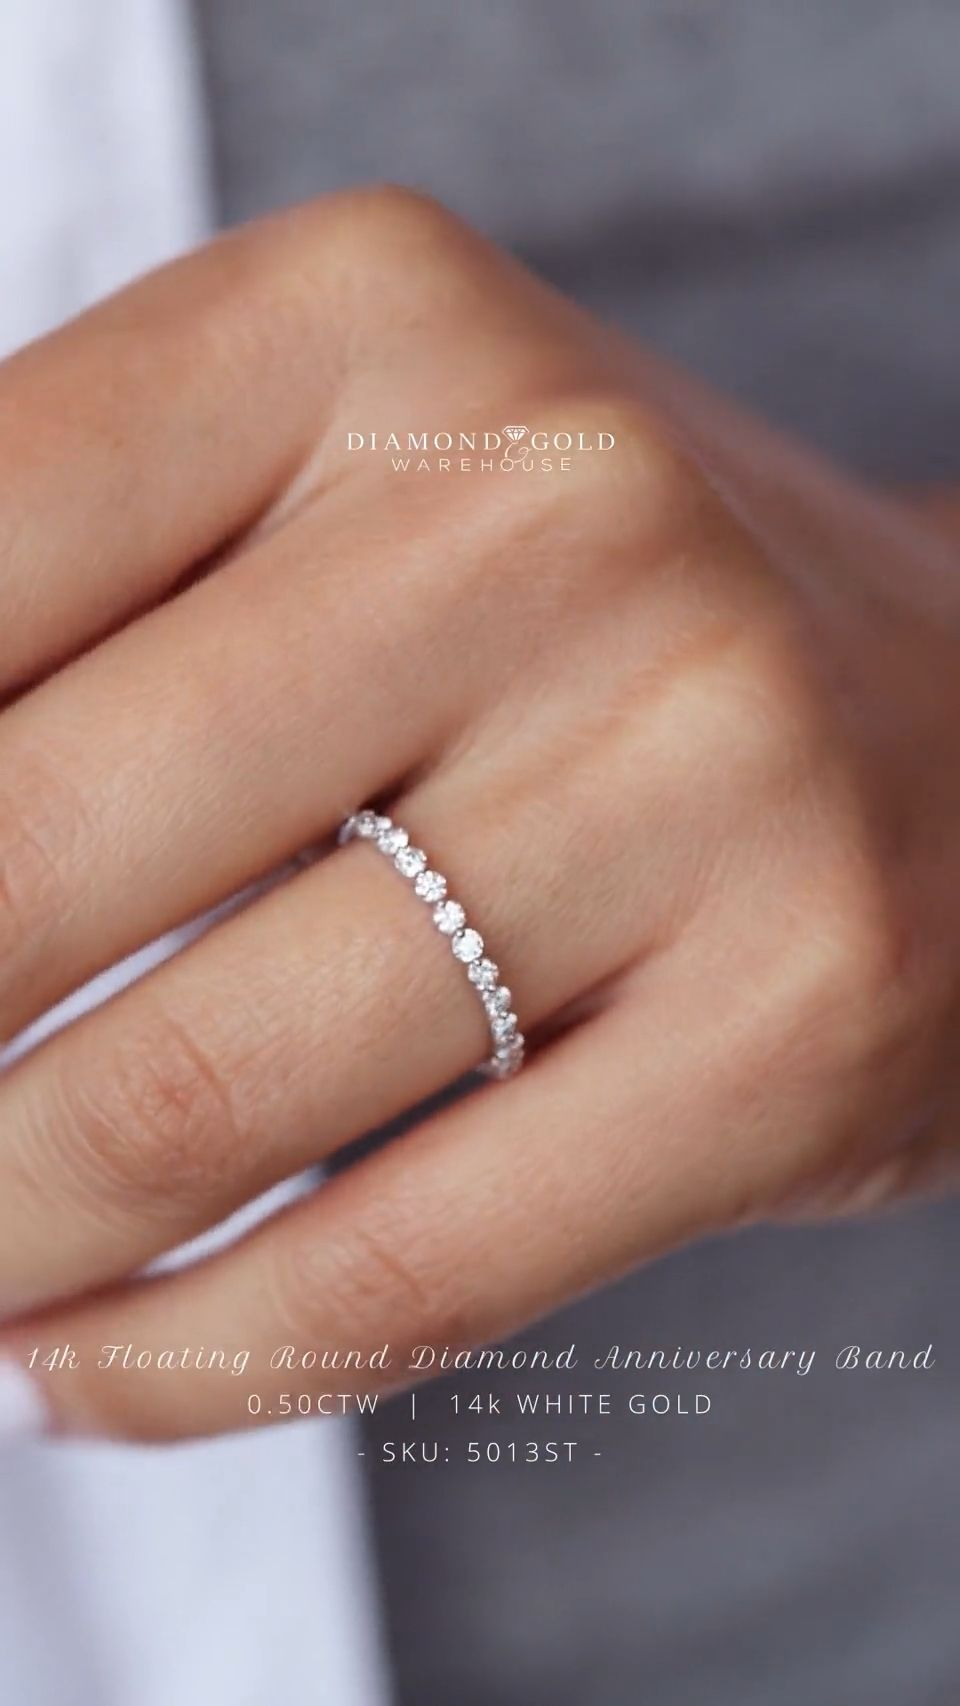 Rings For Women Unique Rings For Women Simple Rings For Women Fashion Finger Rings For Women Wedding Rings For Women Rings For Wome Dugun Gruplari Alyans Elmas